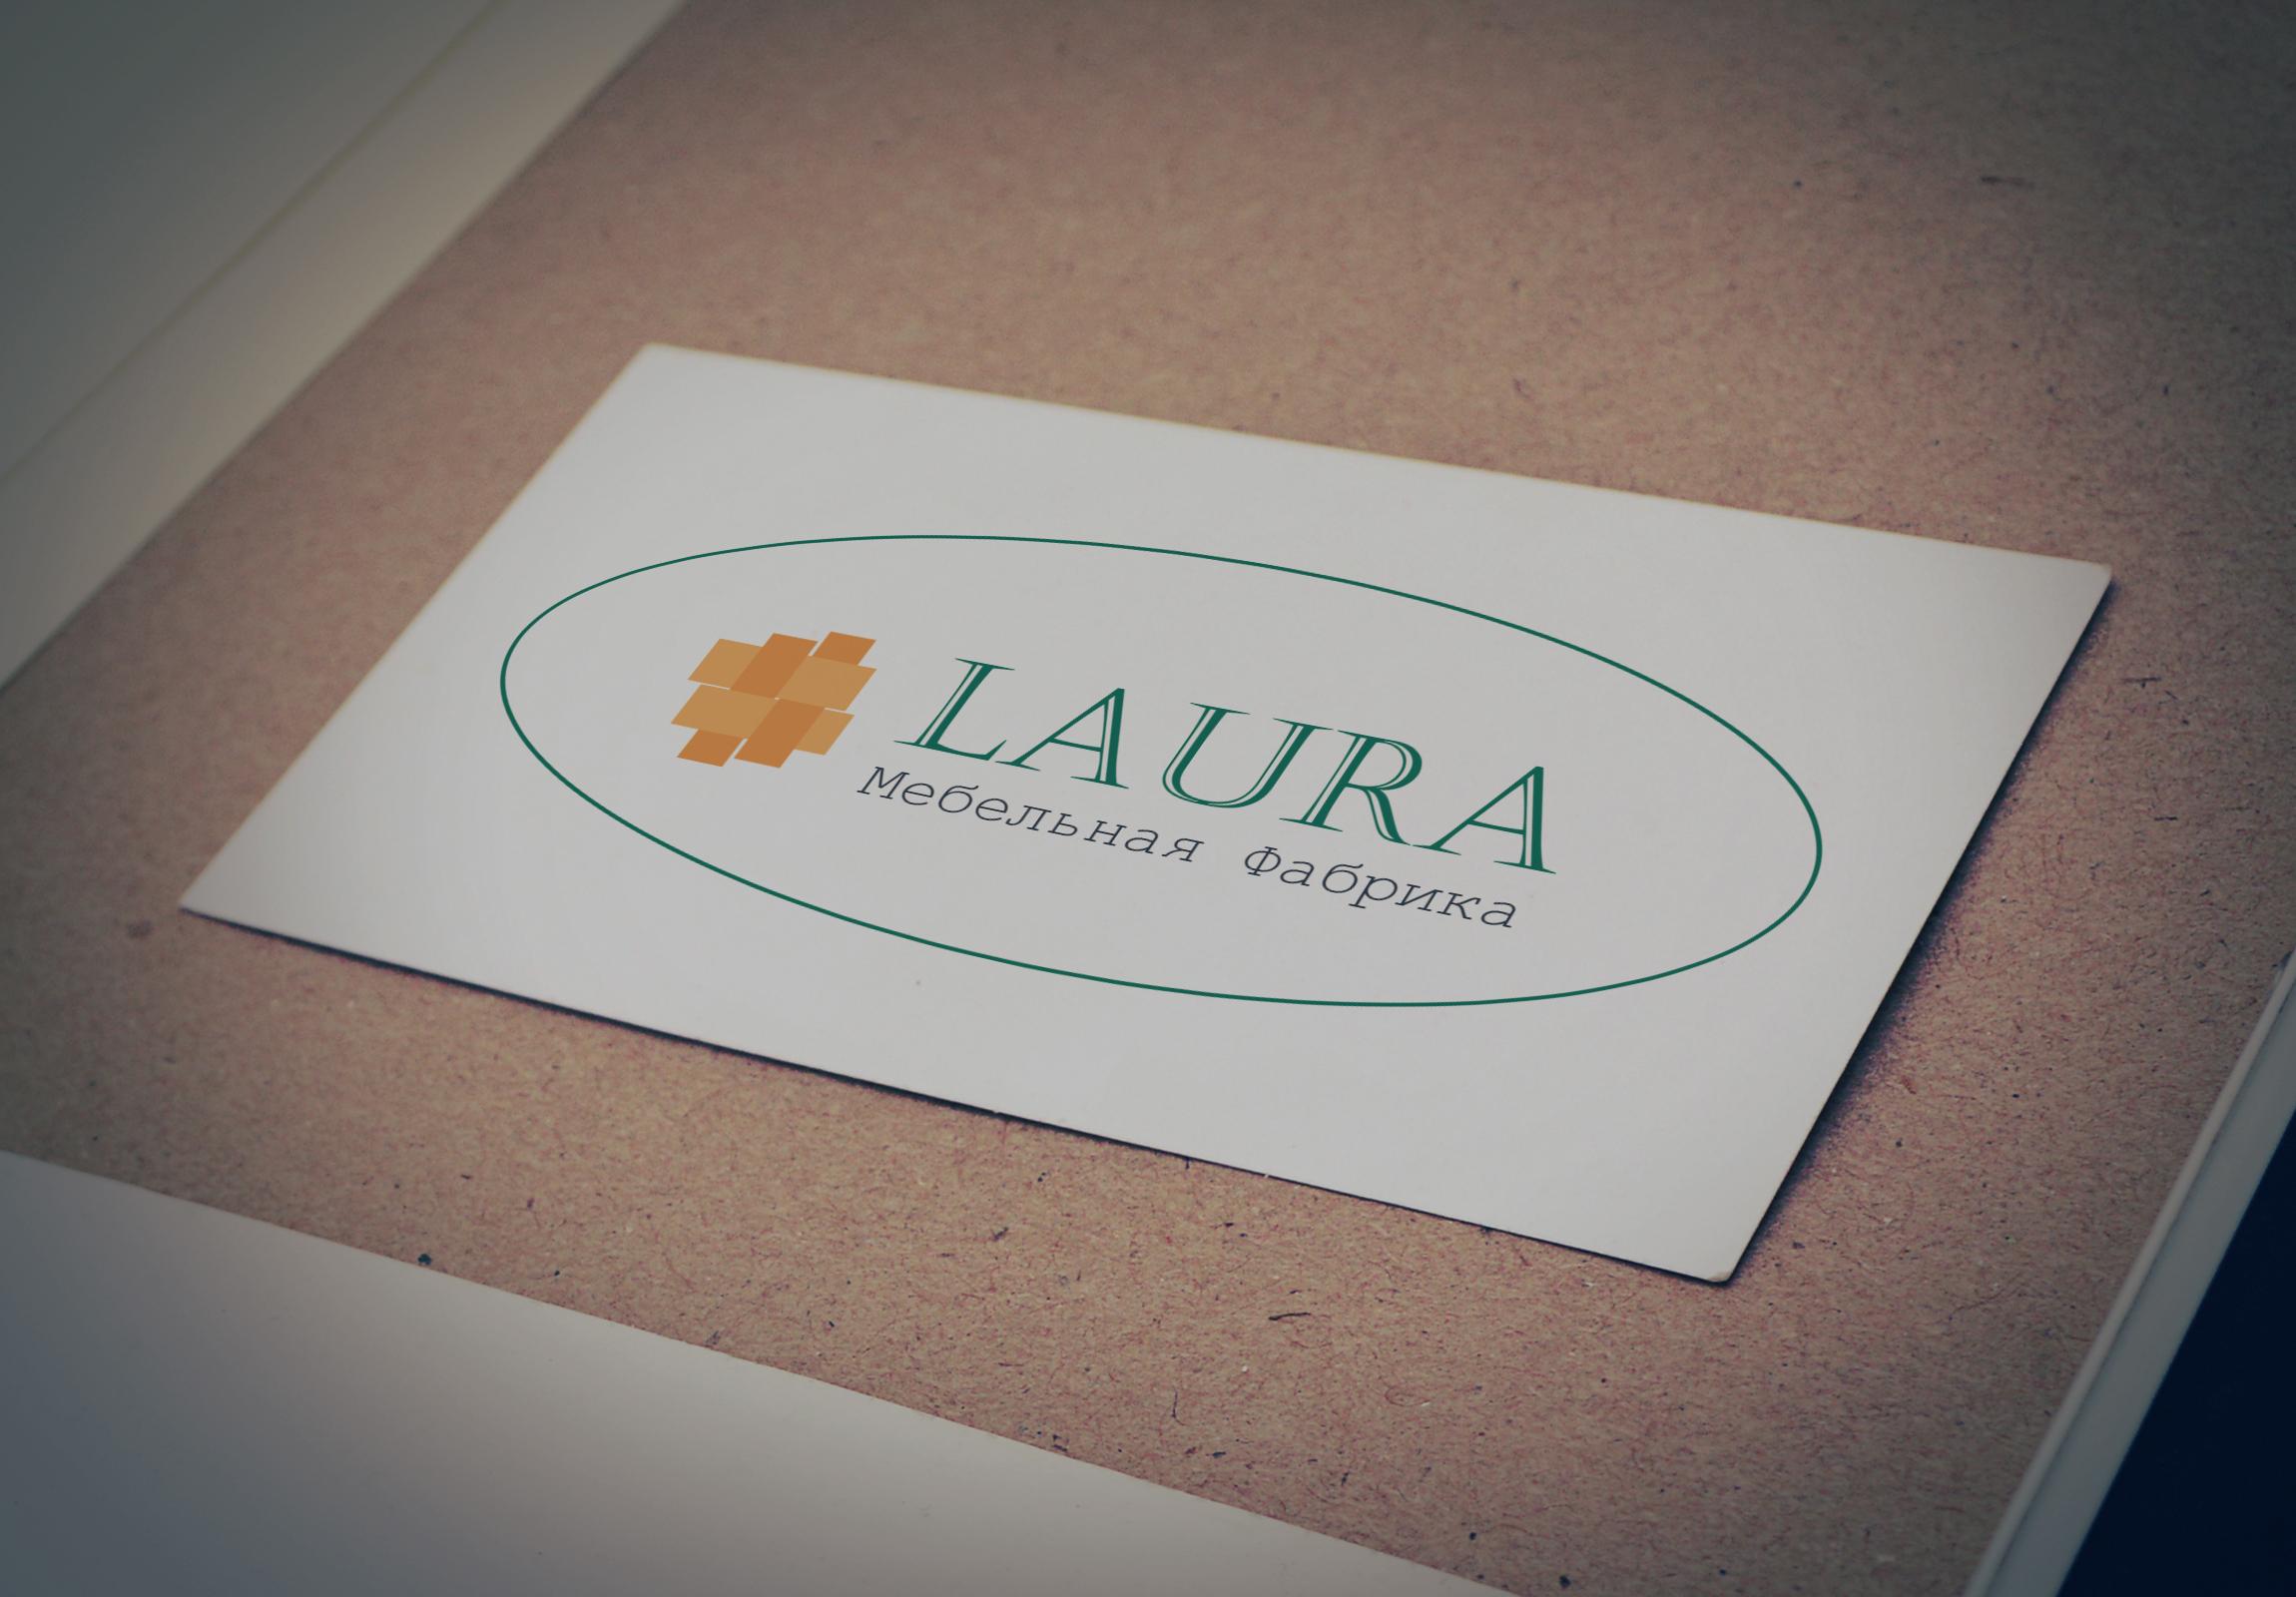 Разработать логотип для фабрики мебели фото f_41859b989d0ead42.jpg